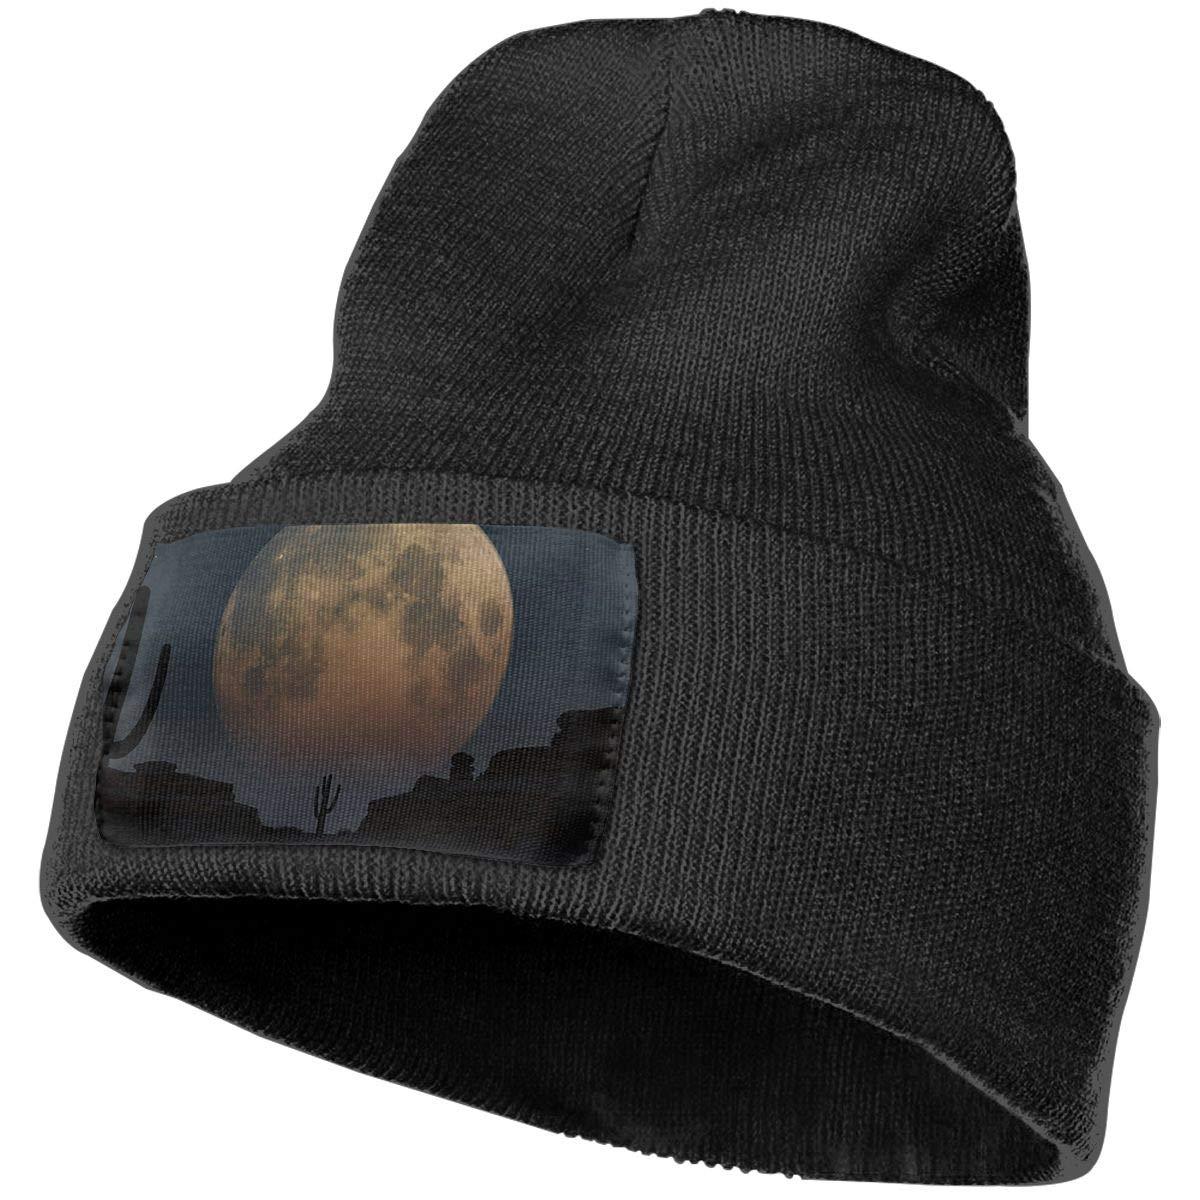 Xugui Unknown Strange Beanie Hat Mens Womens Winter Warm Cap Chunky Cuff Slouchy Beanie